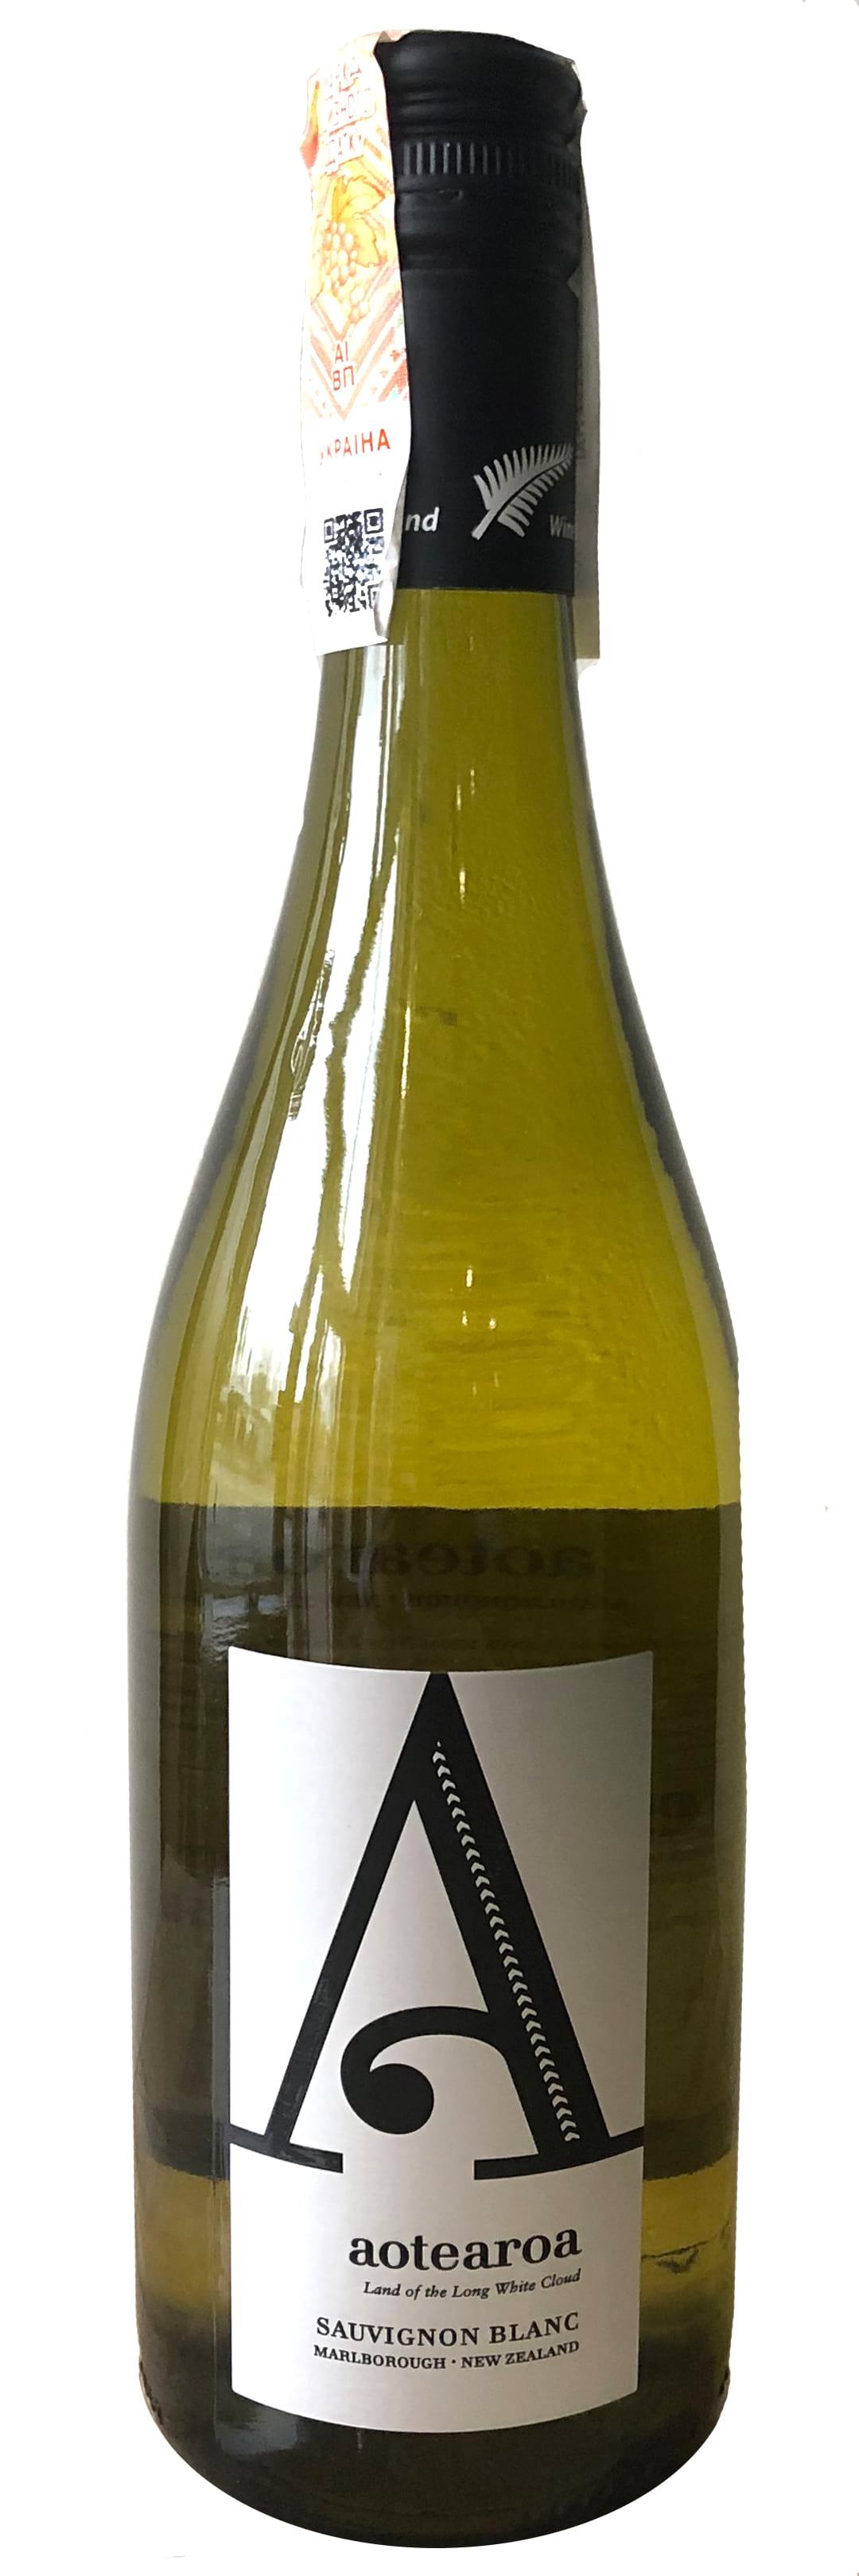 Origin Global Distribution Aotearoa Sauvignon Blanc фото